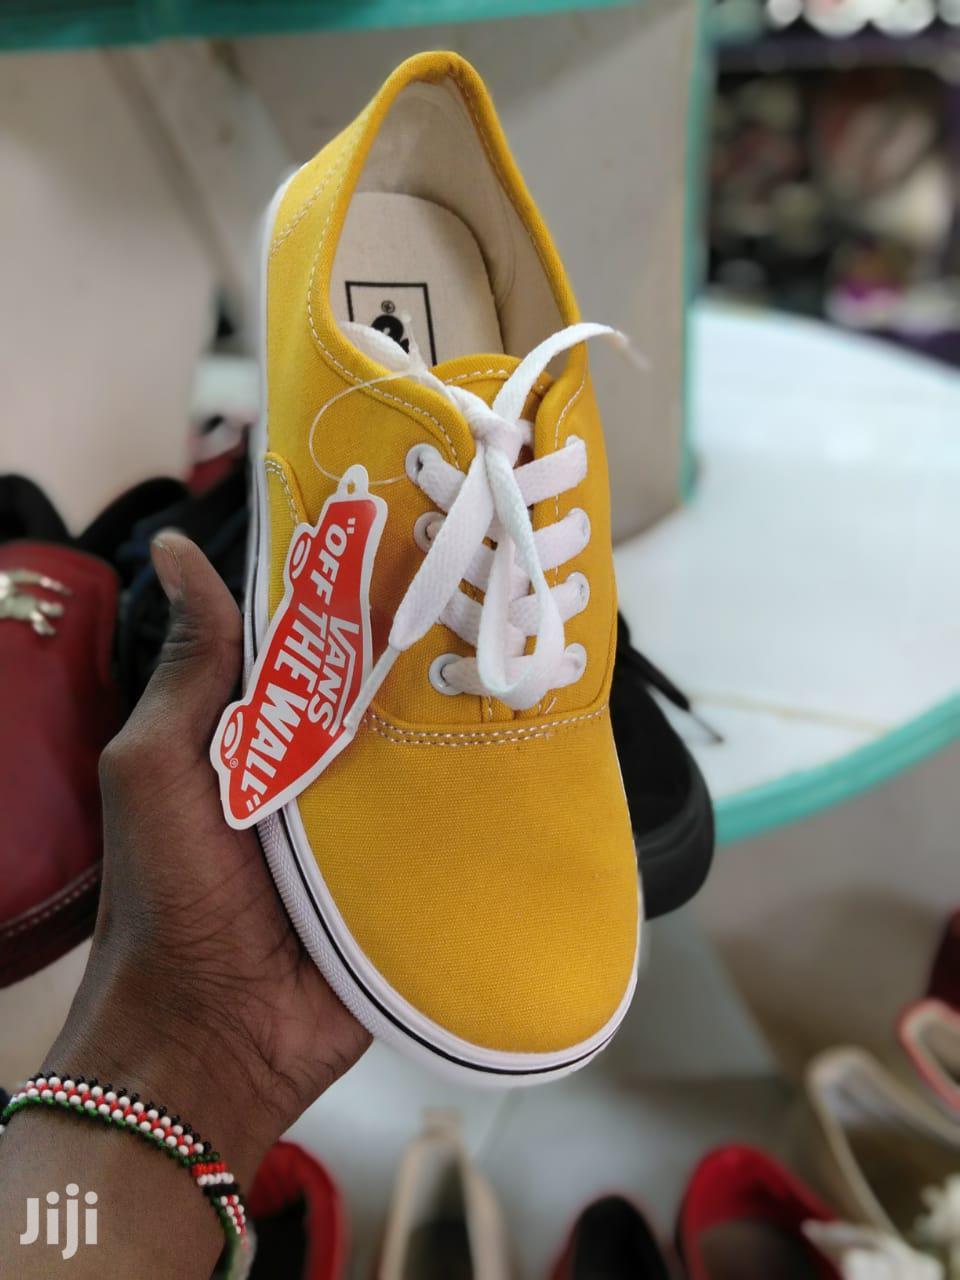 Vans Rubbers | Shoes for sale in Nairobi Central, Nairobi, Kenya